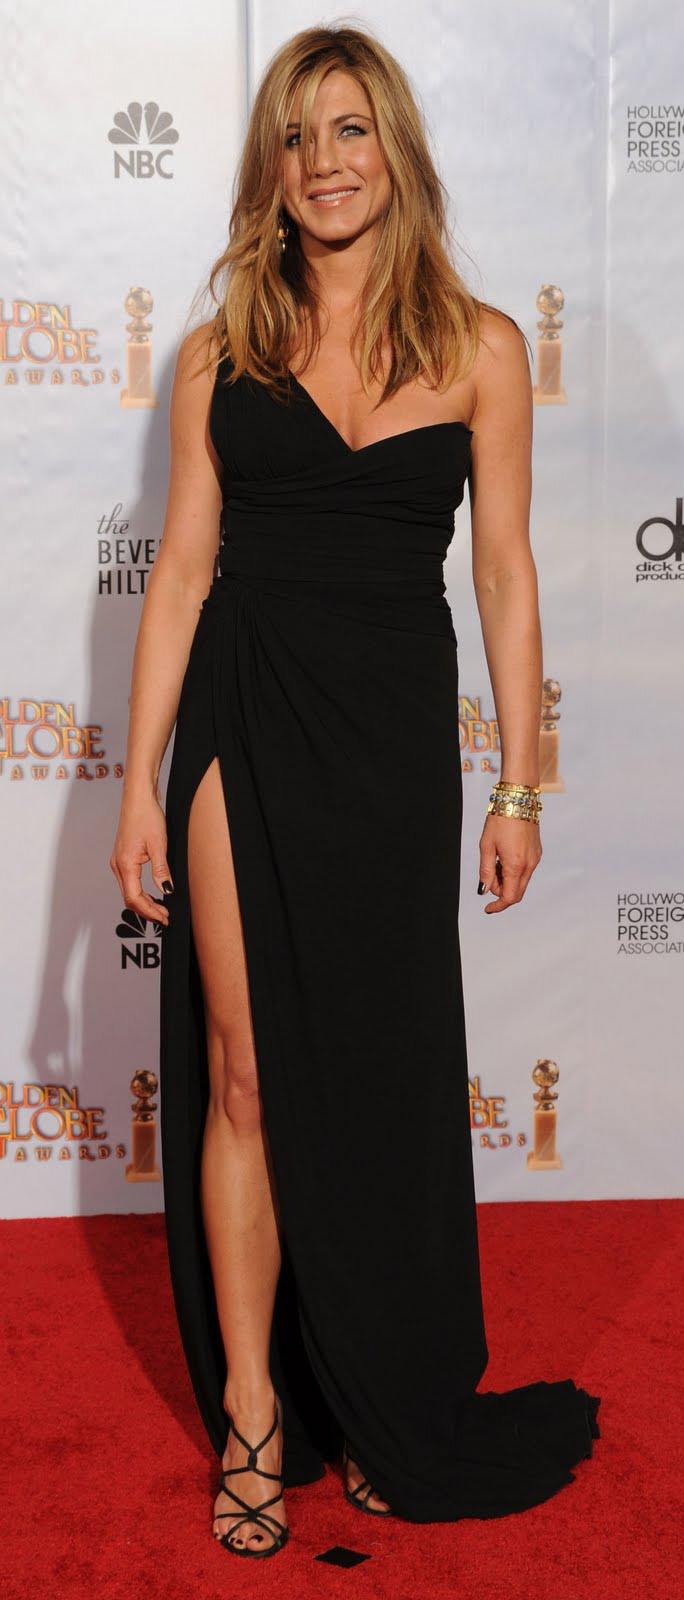 elegant-natural-sporty-style-type-jenniferaniston-black-dress-simple-gown-oneshoulder.jpg